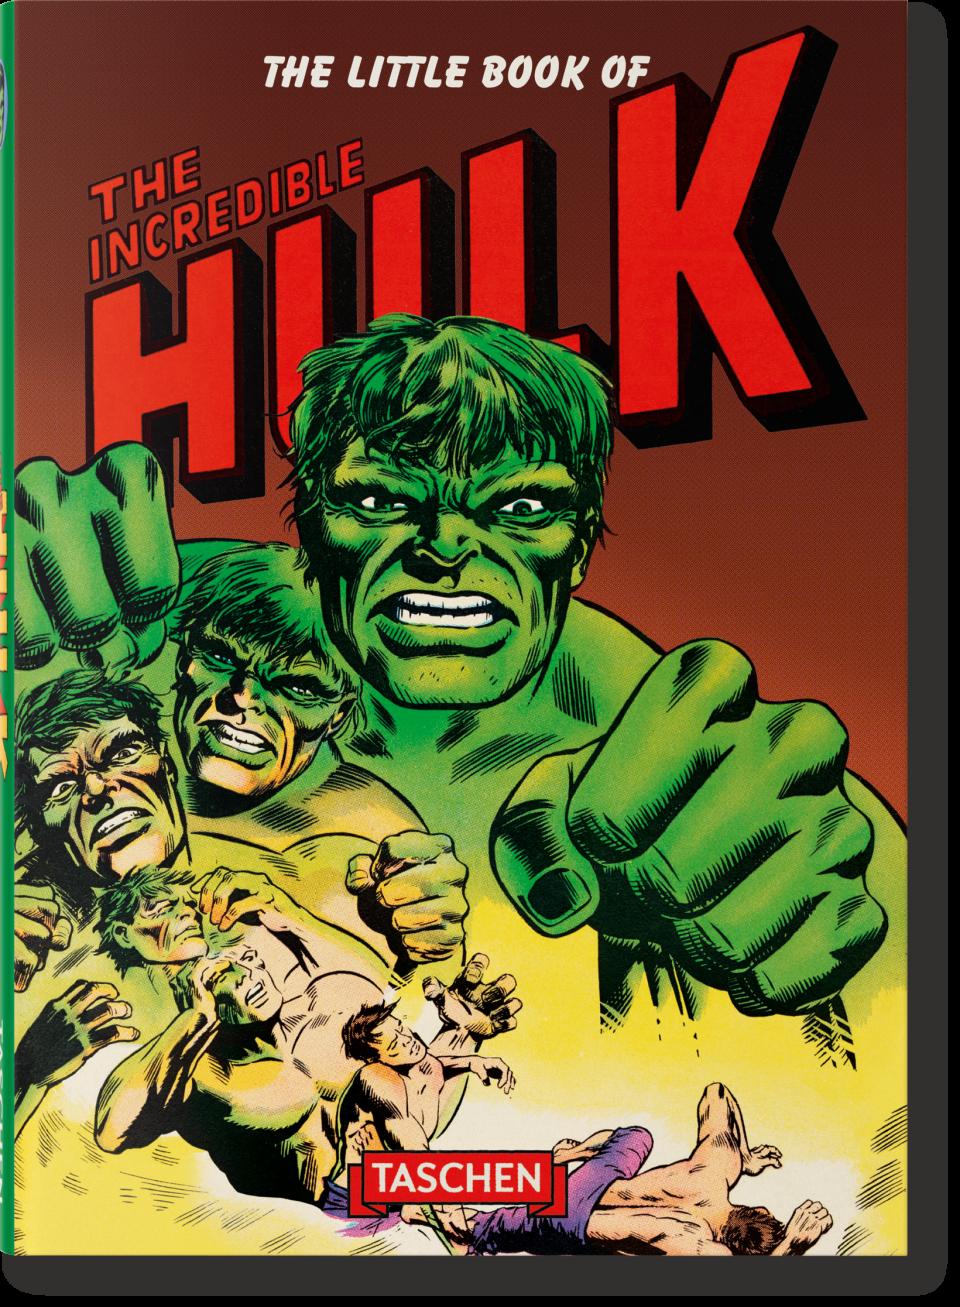 The Little Book of Hulk.